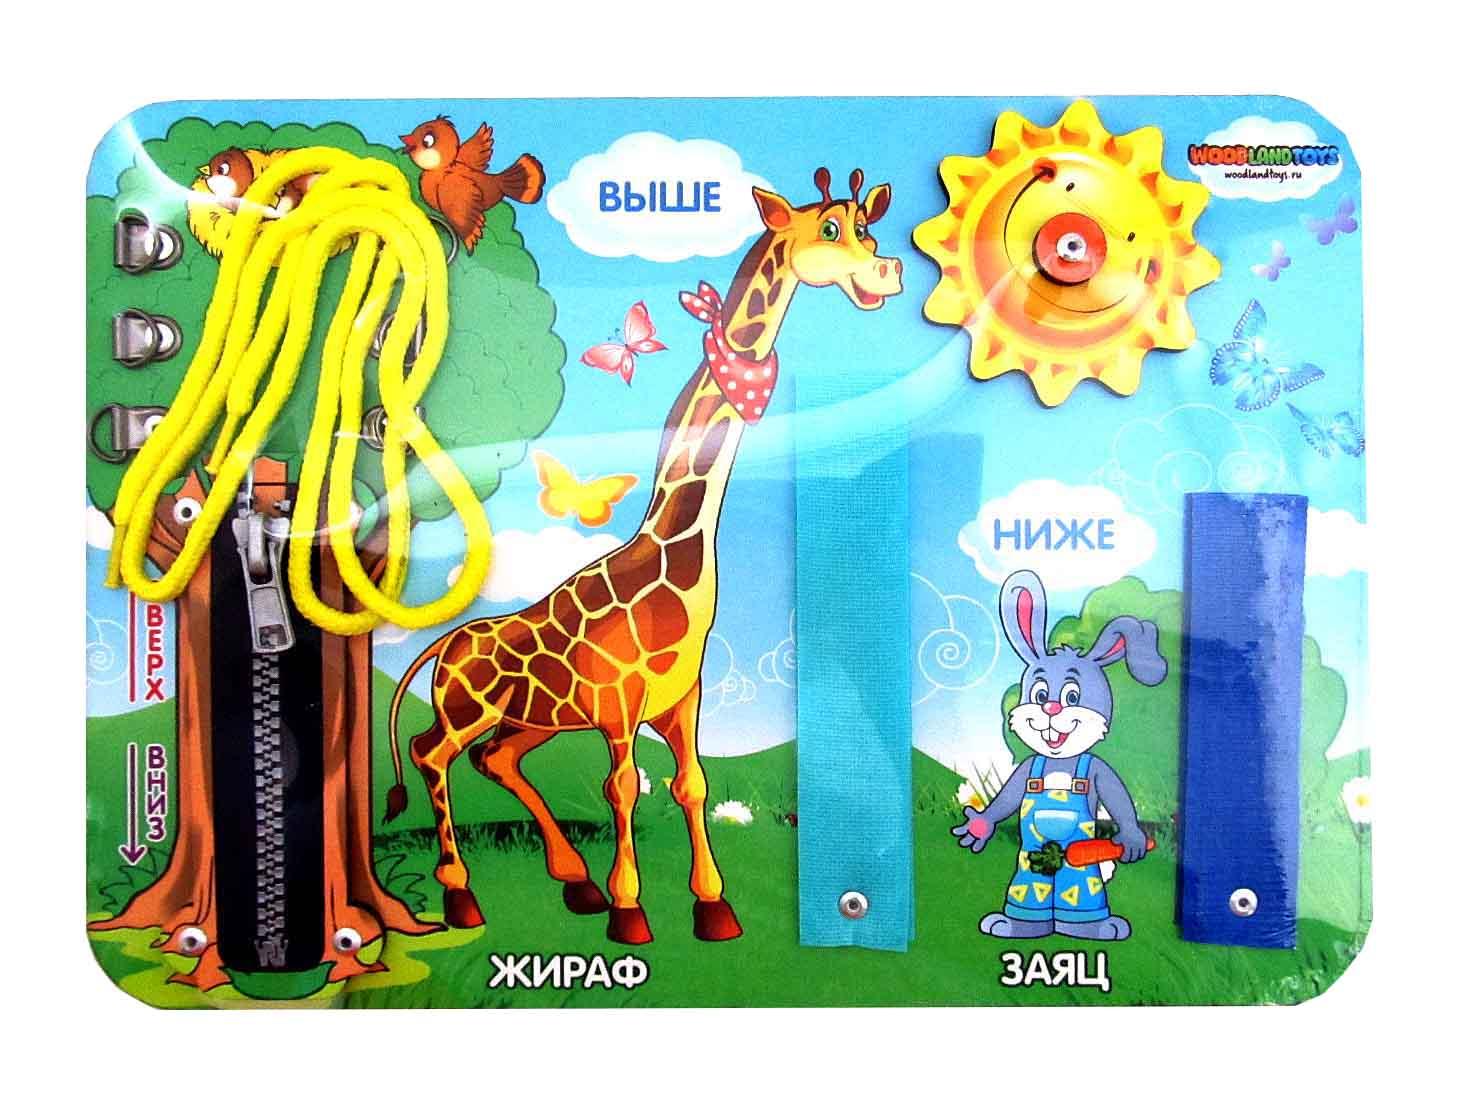 Бизиборд «Выше-Ниже», 19,5 х 27,5 см (шнурок,липучка,молния,крутилка) (Арт. 112201)